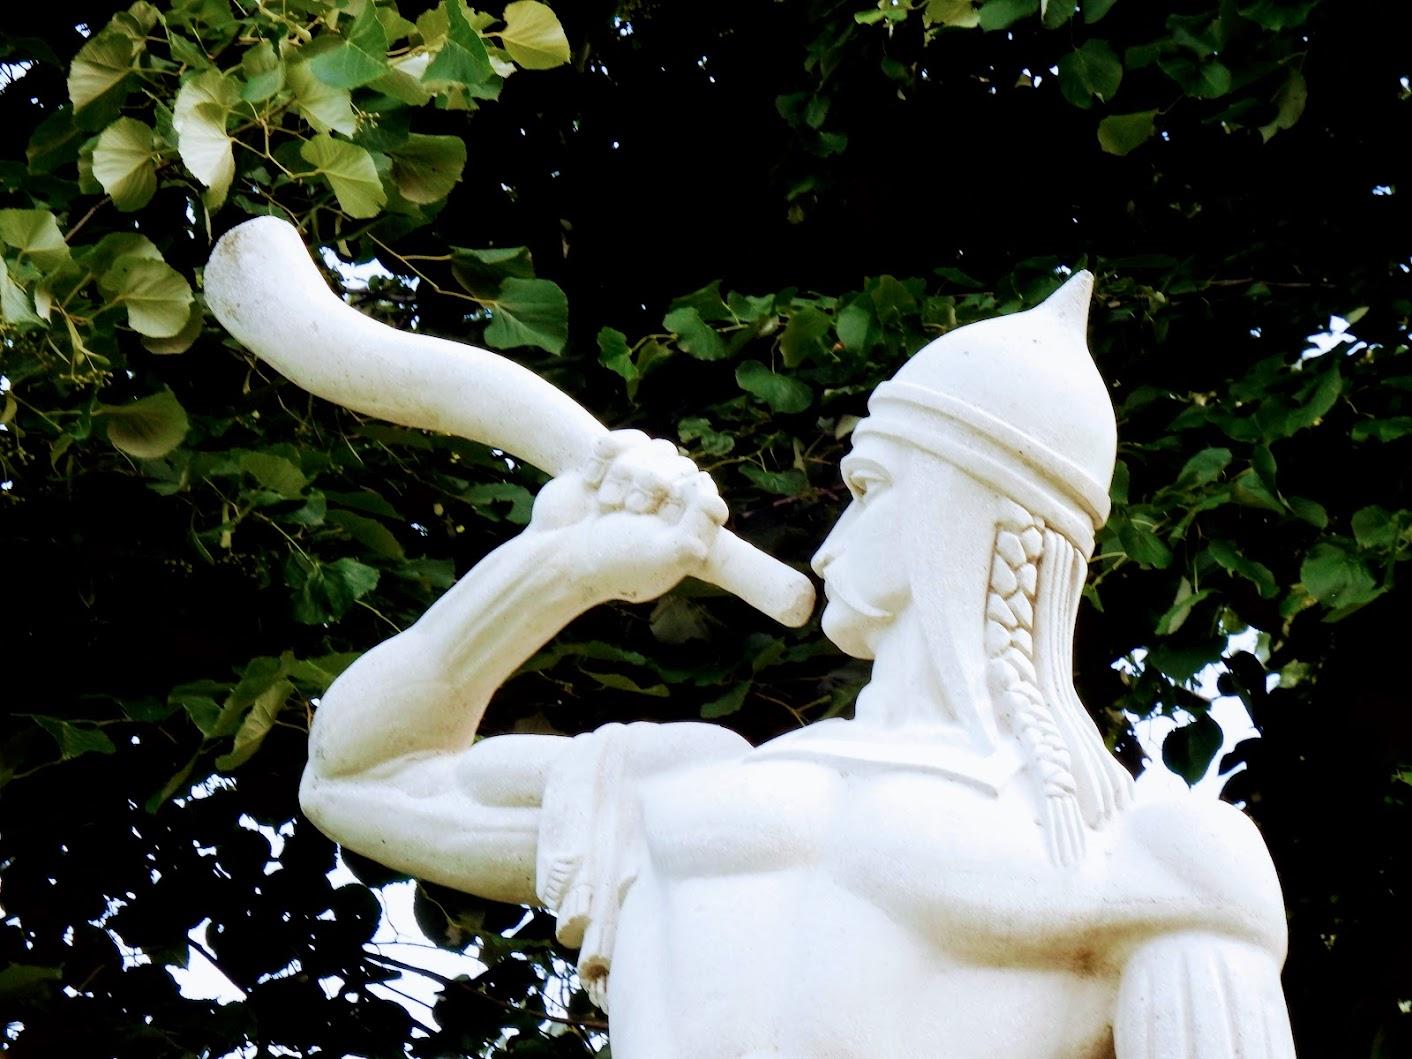 Árpád-kori kürtös a Jáki úti köztemetőben